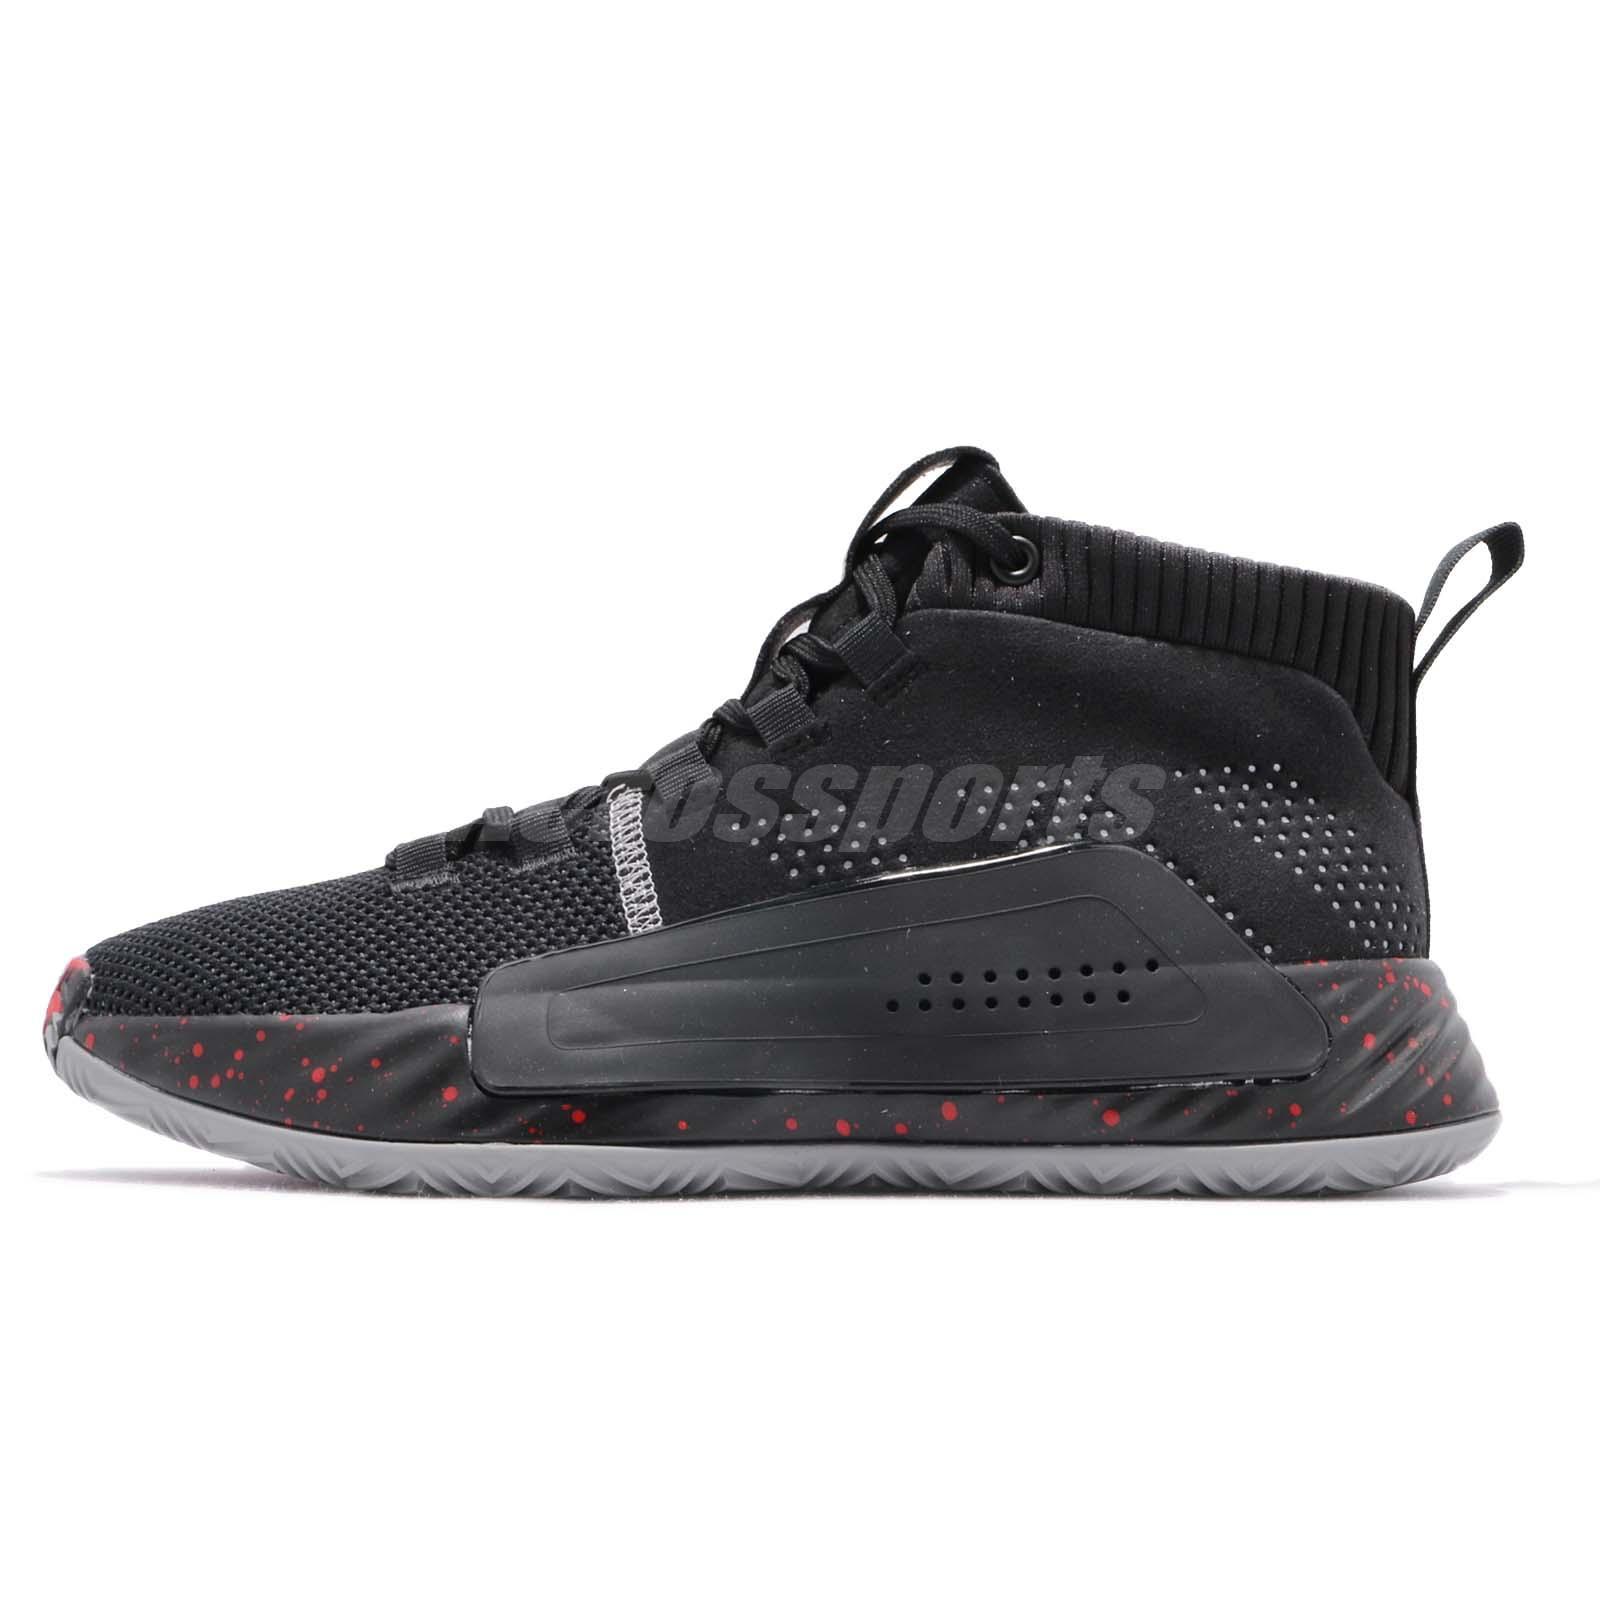 adidas Dame 5 J V Damian Lillard Black Grey Red Kid Women Basketball Shoe  BB8062 cf51f15ef